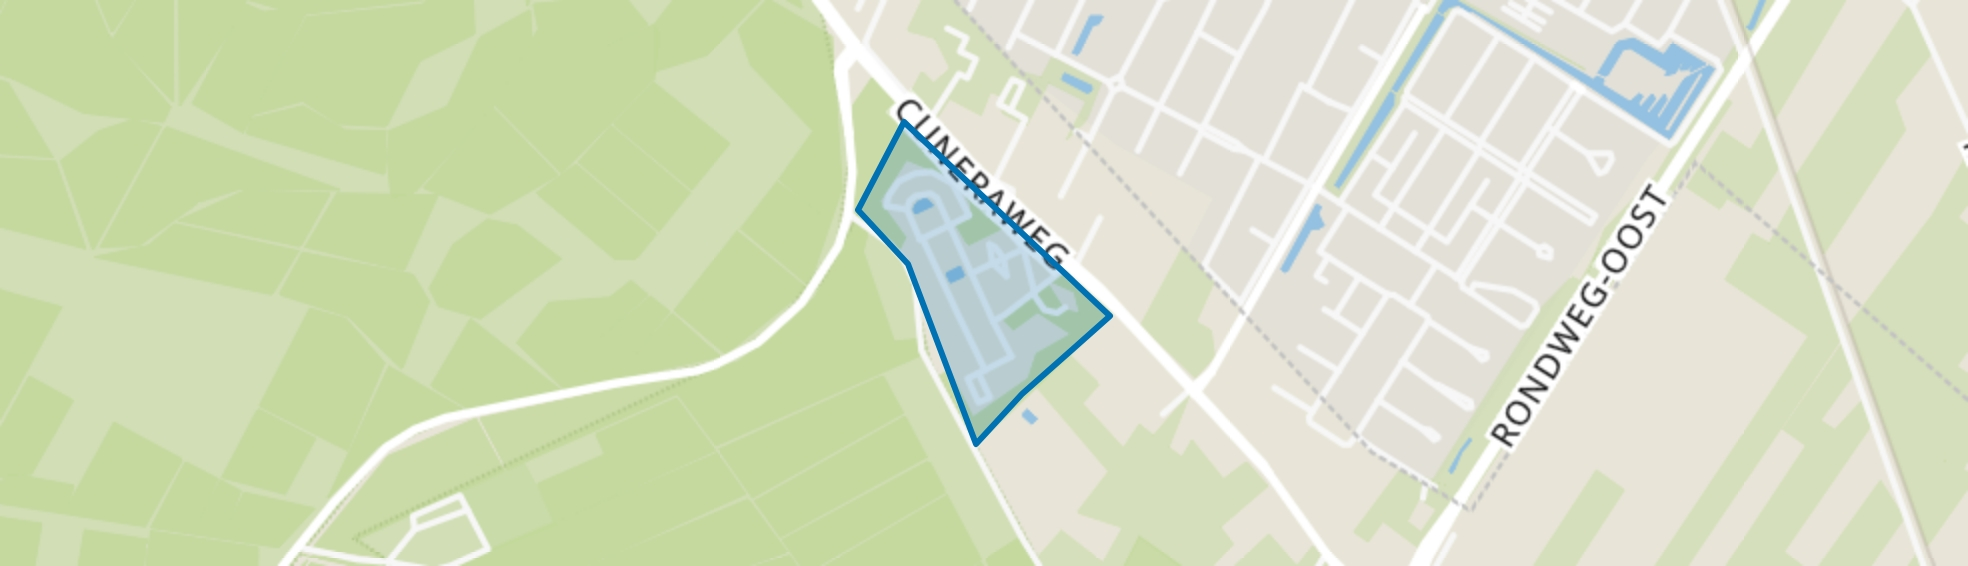 Rhenendael, Rhenen map